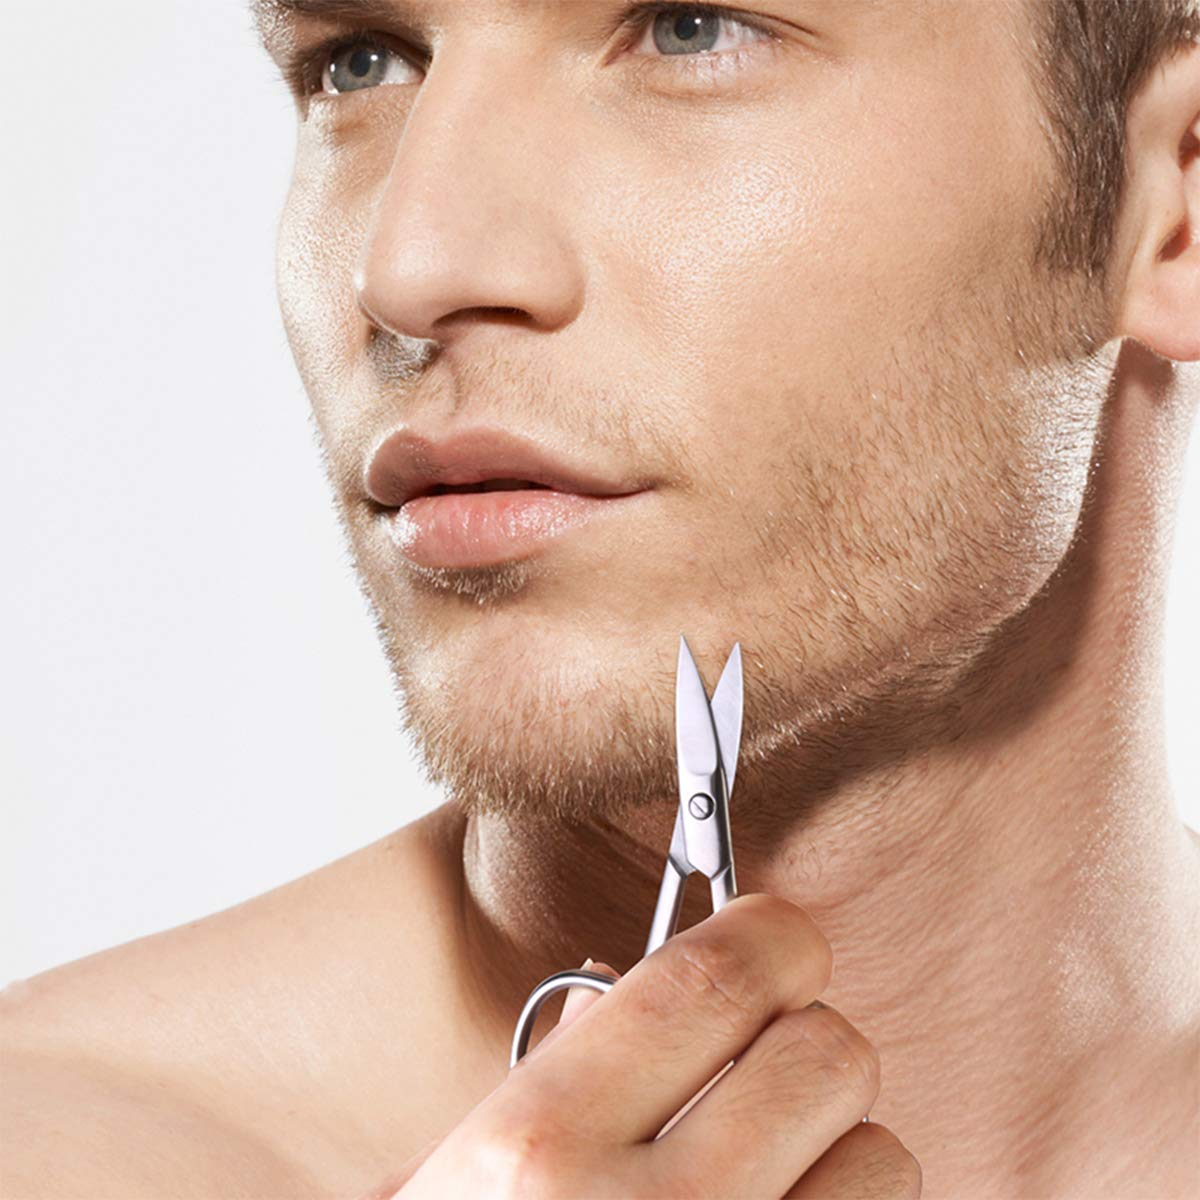 Nose Hair Scissors Beard Eyebrow Trimmer Scissors Stainless Steel Set with Storage Box